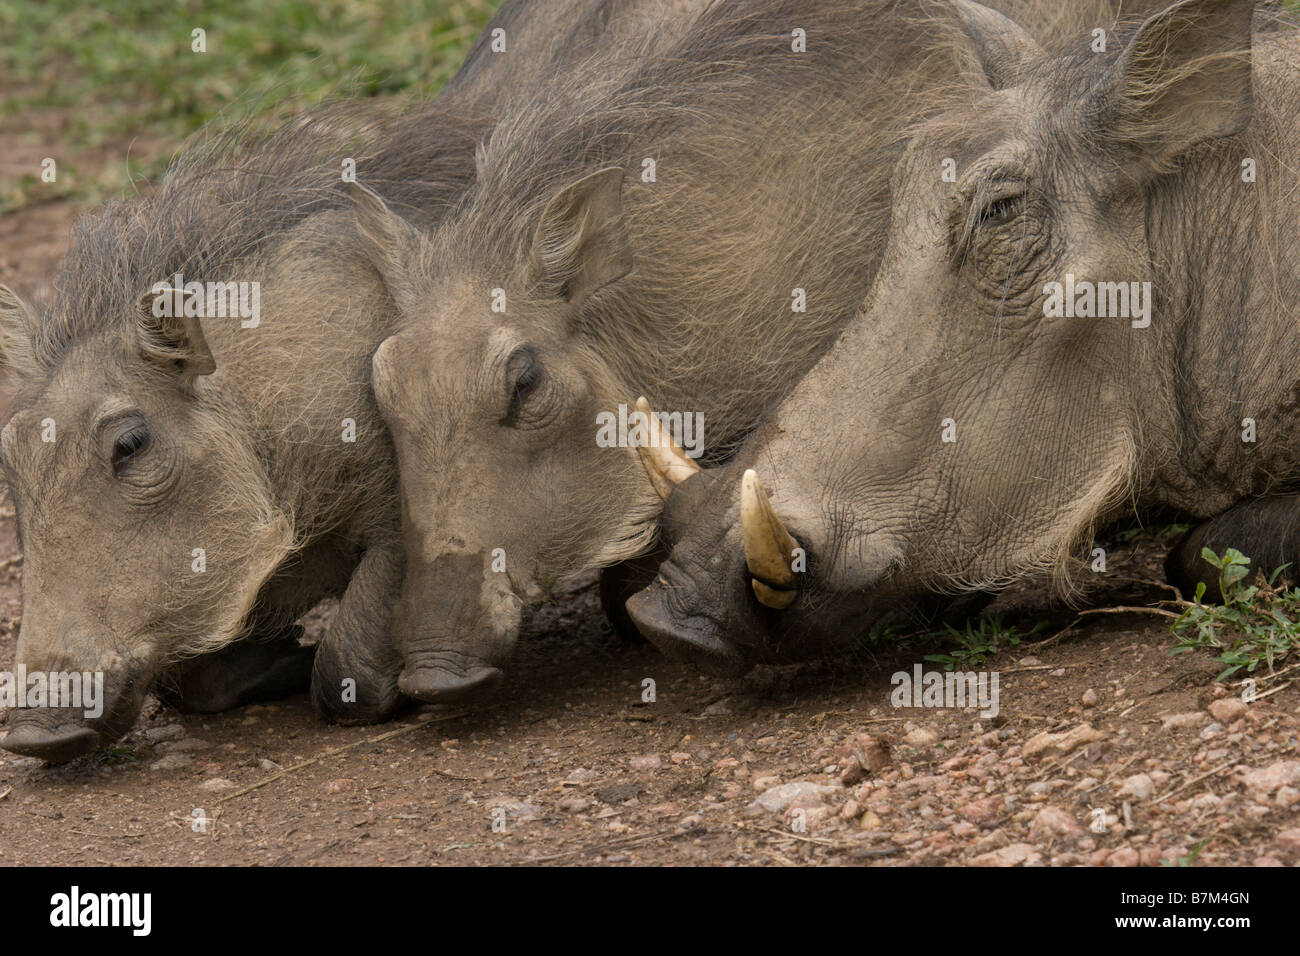 pig pigs wild pigs wild boar boars bush hog - Stock Image